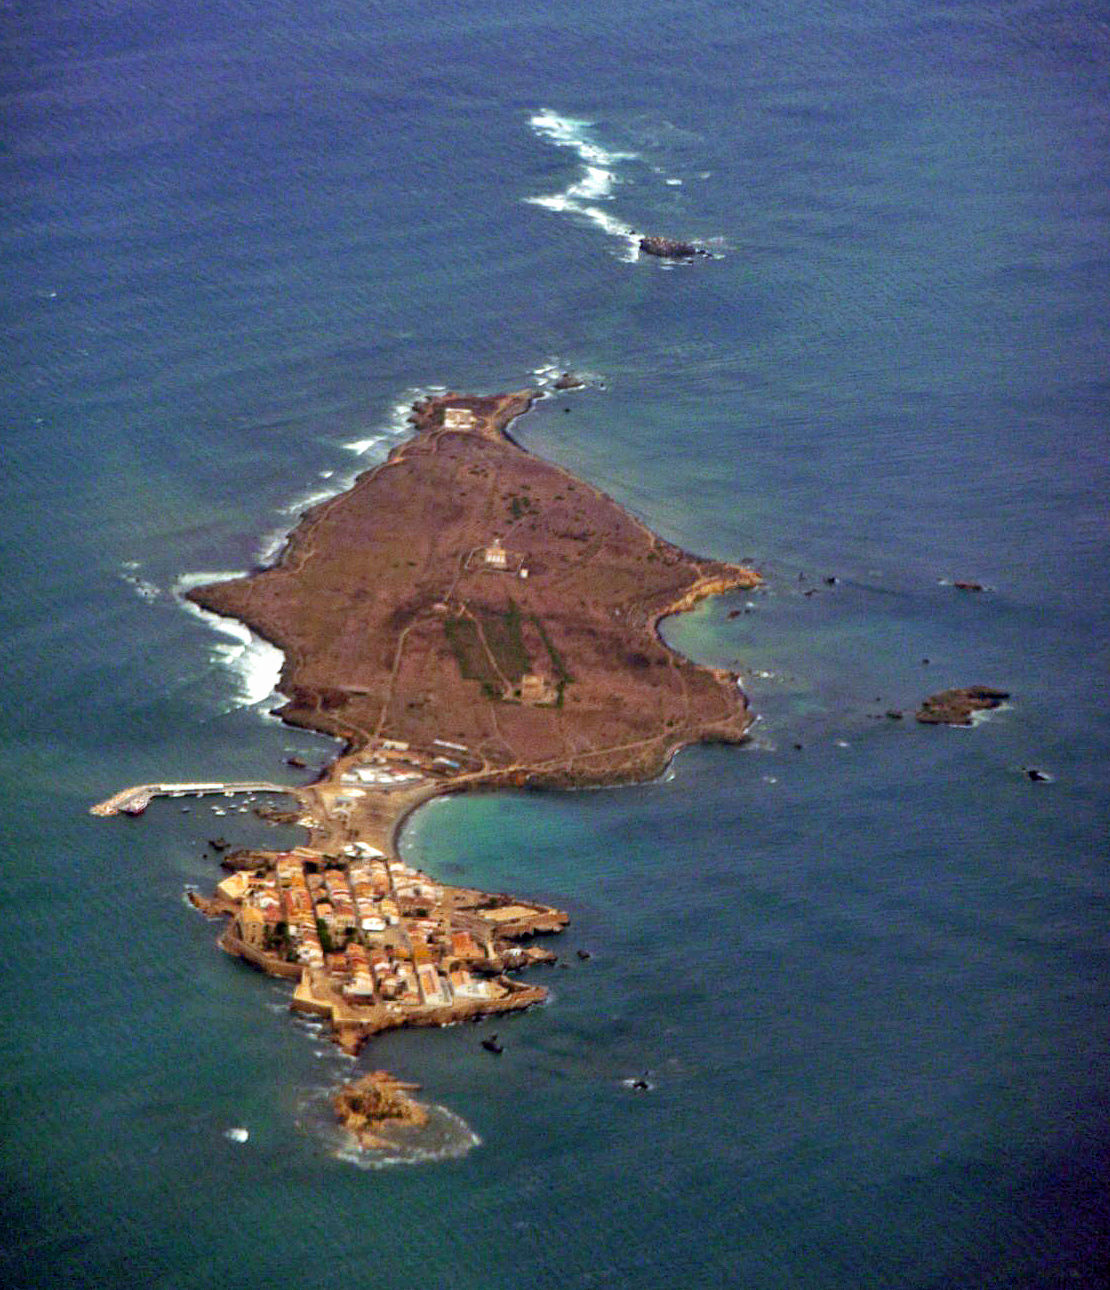 Alicante beaches playas island of tabarca isla de tabarca - Alojamiento en isla de tabarca ...